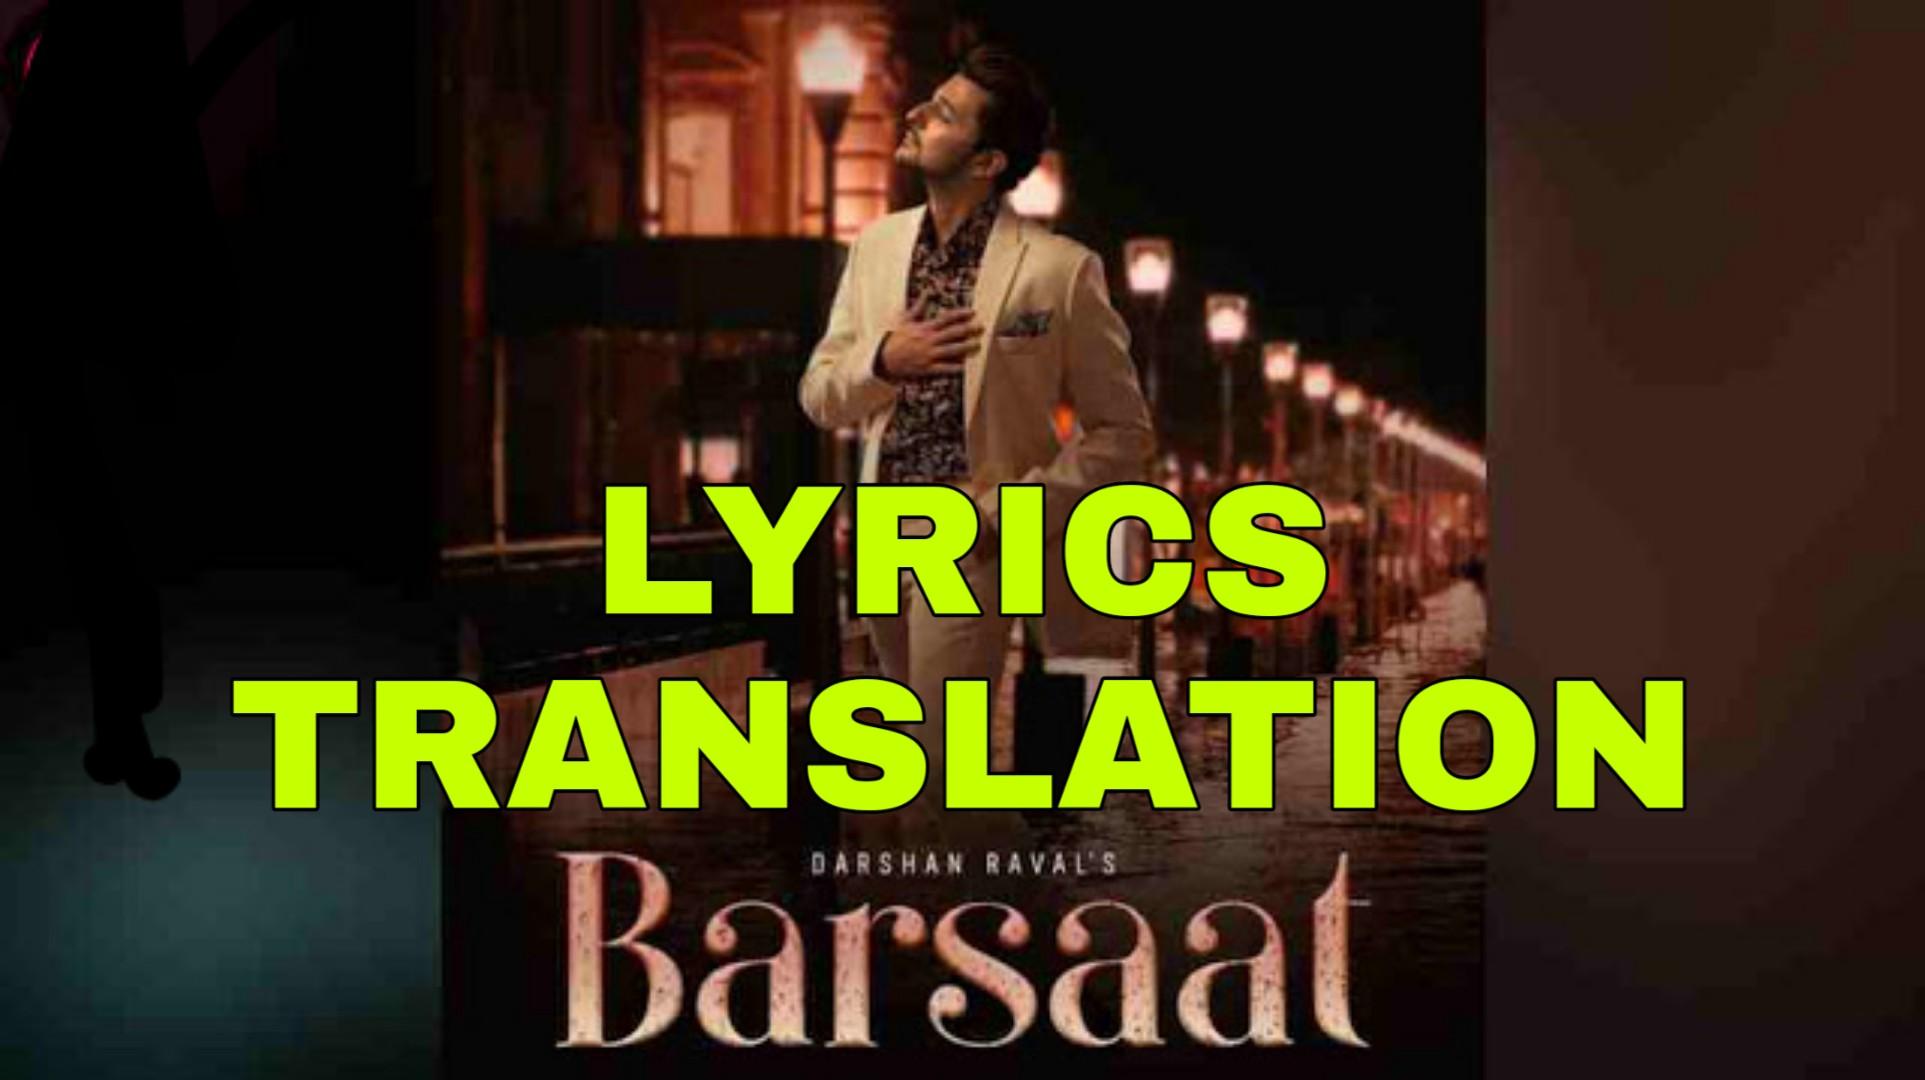 Barsaat Lyrics In English With Translation Darshan Raval Created by líadan on 06 may 2018. barsaat lyrics in english with